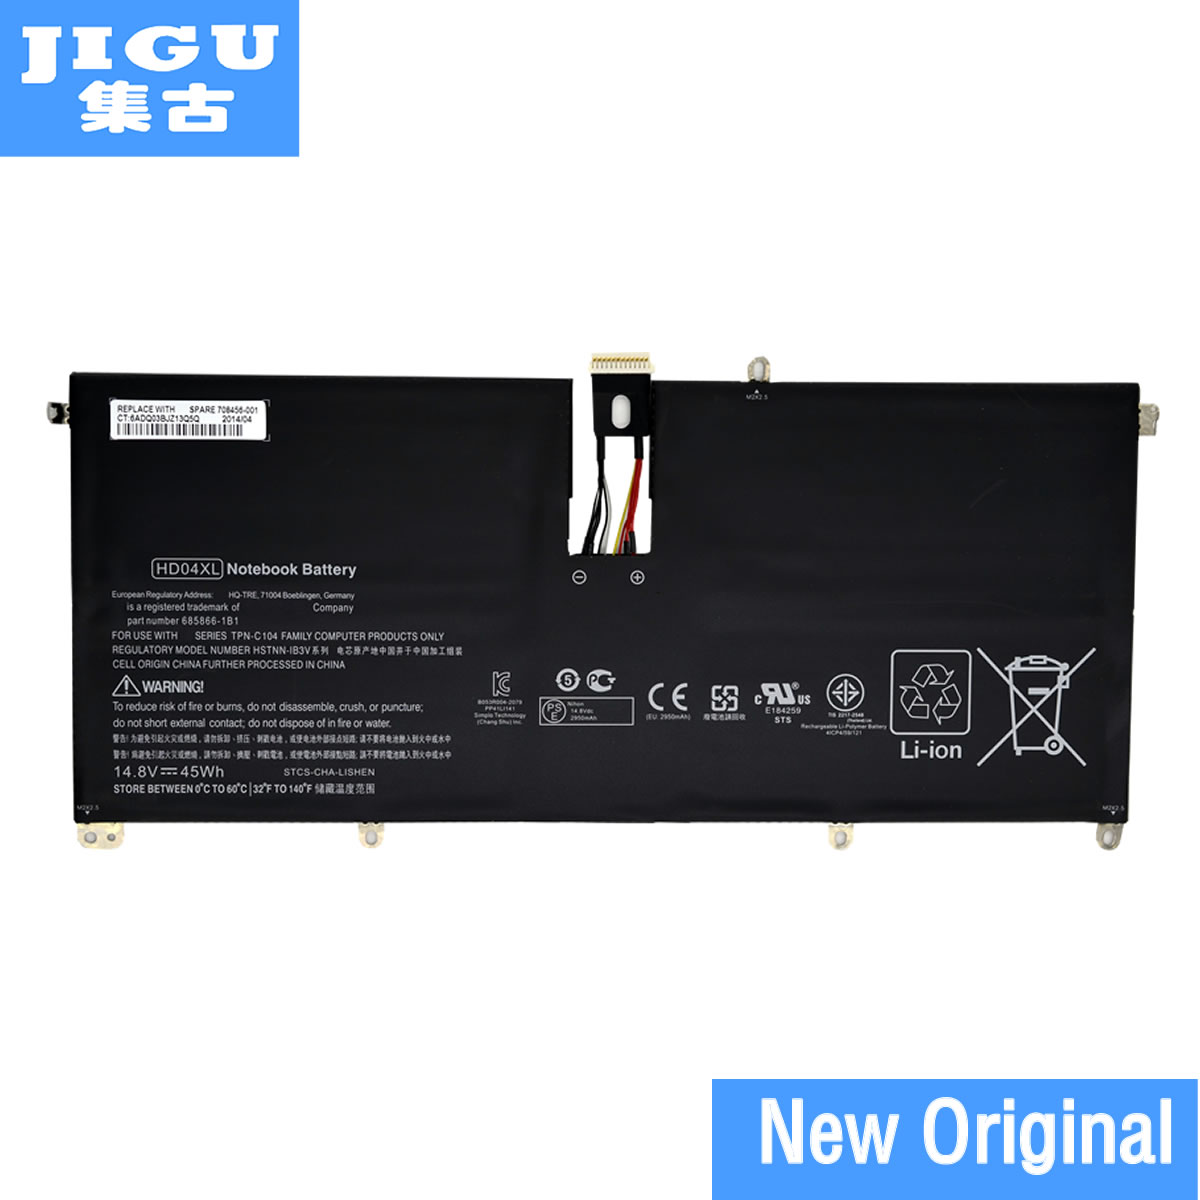 JIGU Véritable Original HD04XL Batterie Pour Hp Envy Spectre Xt 13-2021tu Xt 13-2000eg Xt 13-2120tu 685866-1B1 685866-171 14.8 v 45Wh